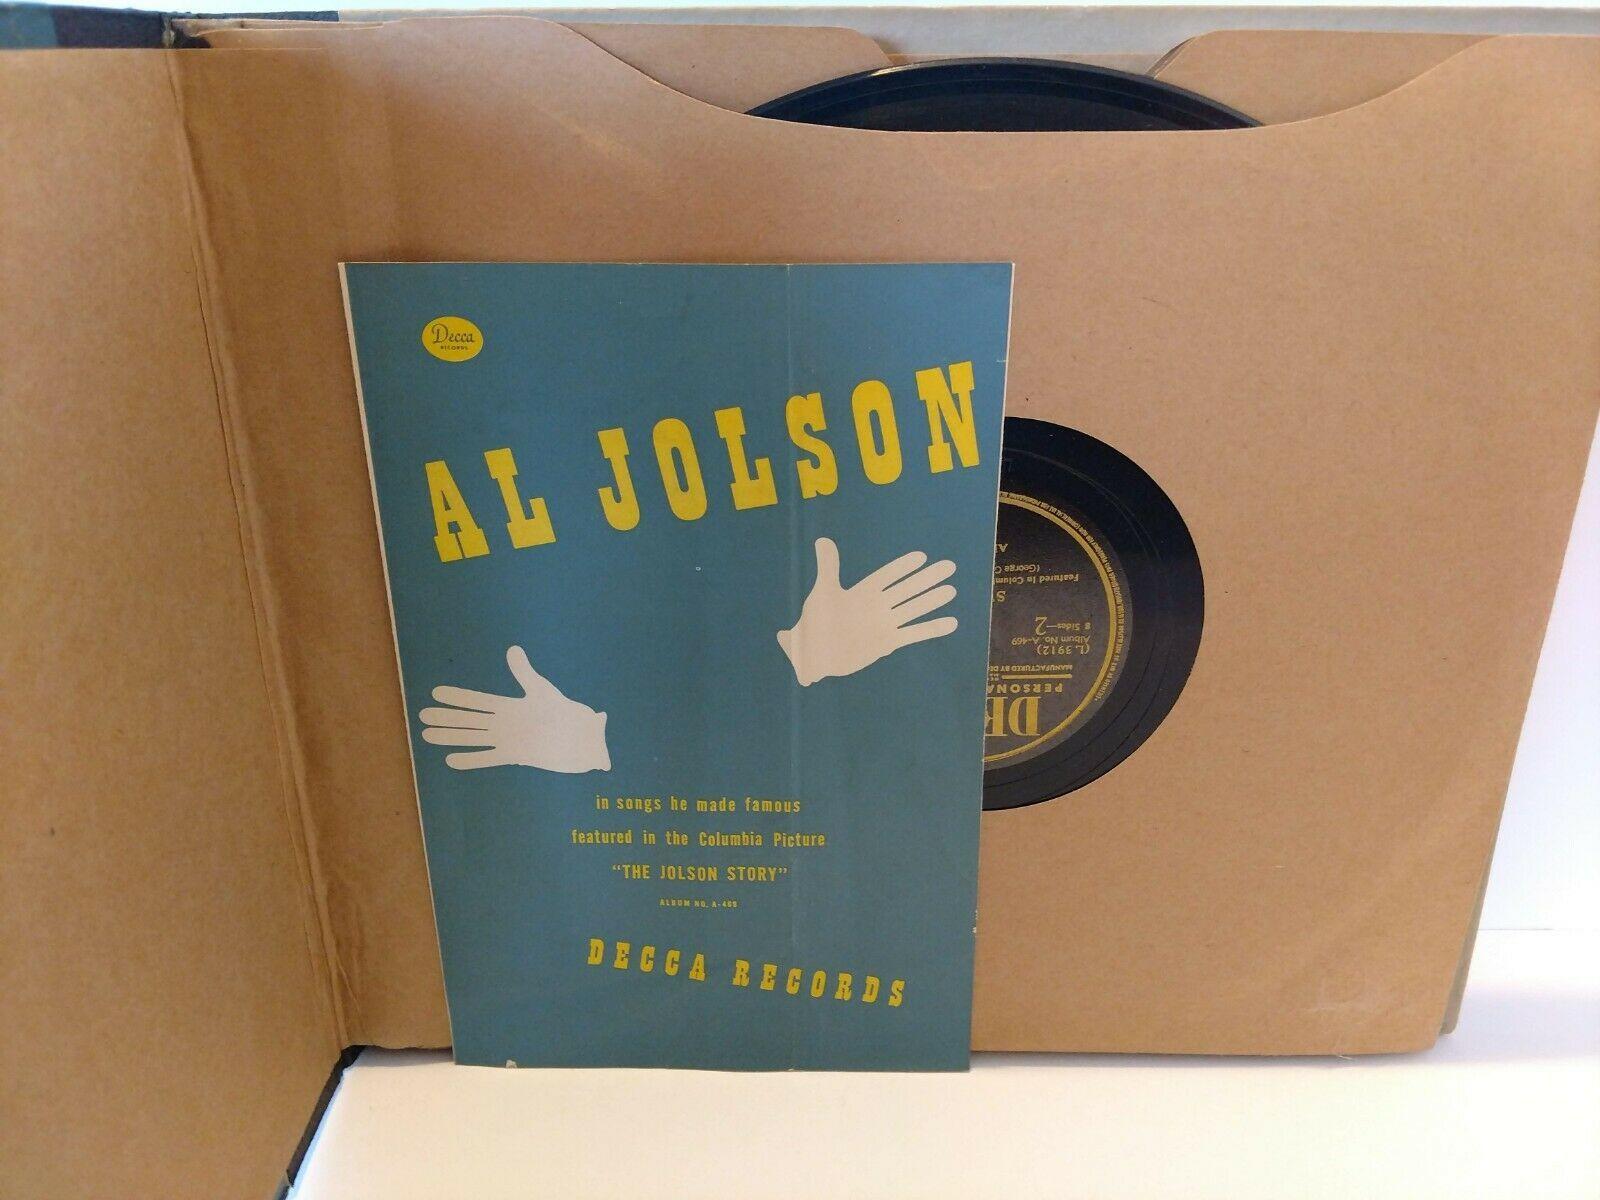 Vintage 4 Record Set 78 RPM Al Jolson Songs He Made Famous Decca